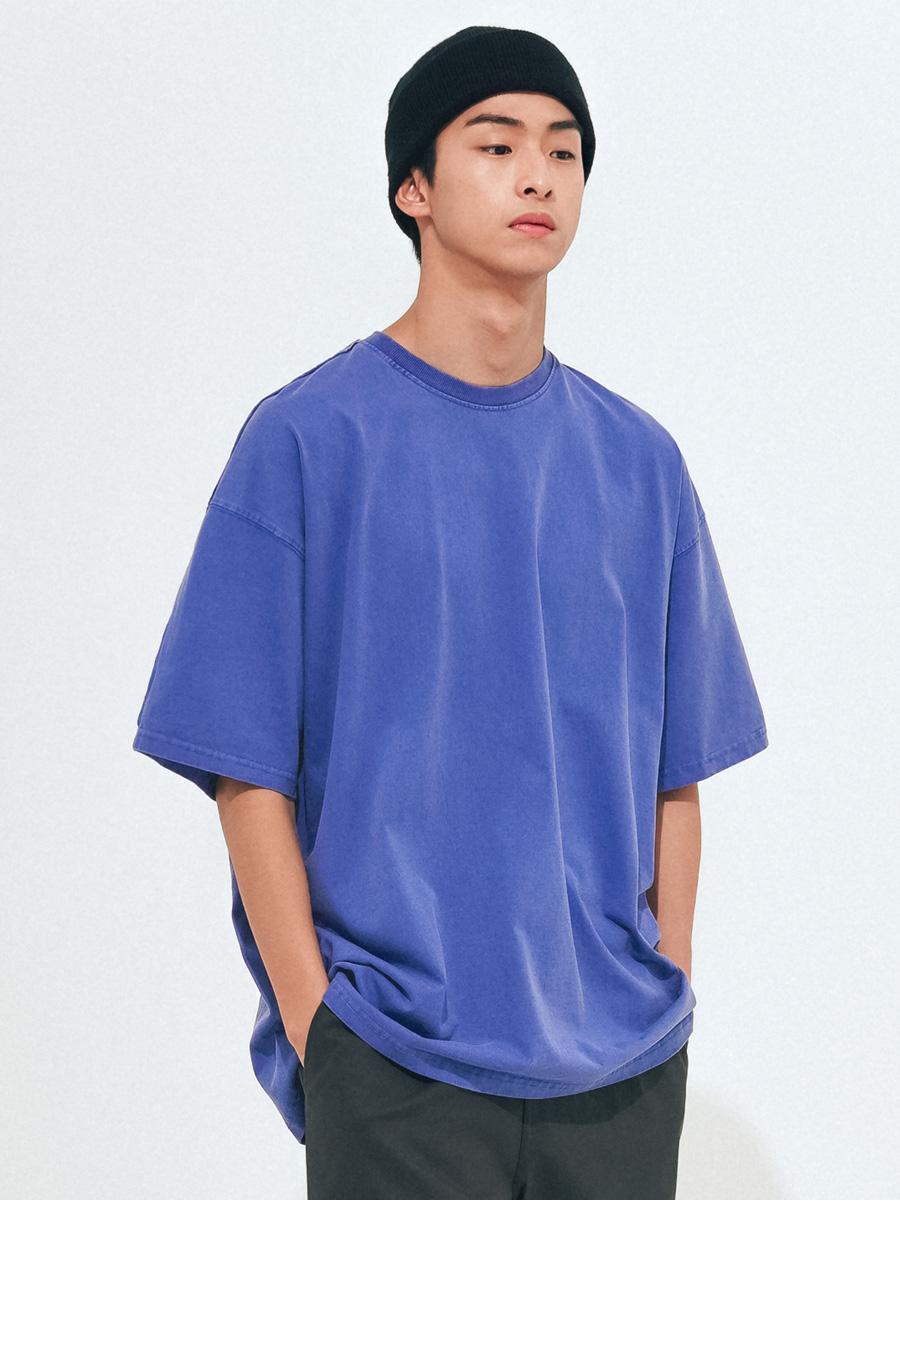 20200522_dy_sidecut_tshirts_model_sh_07.jpg